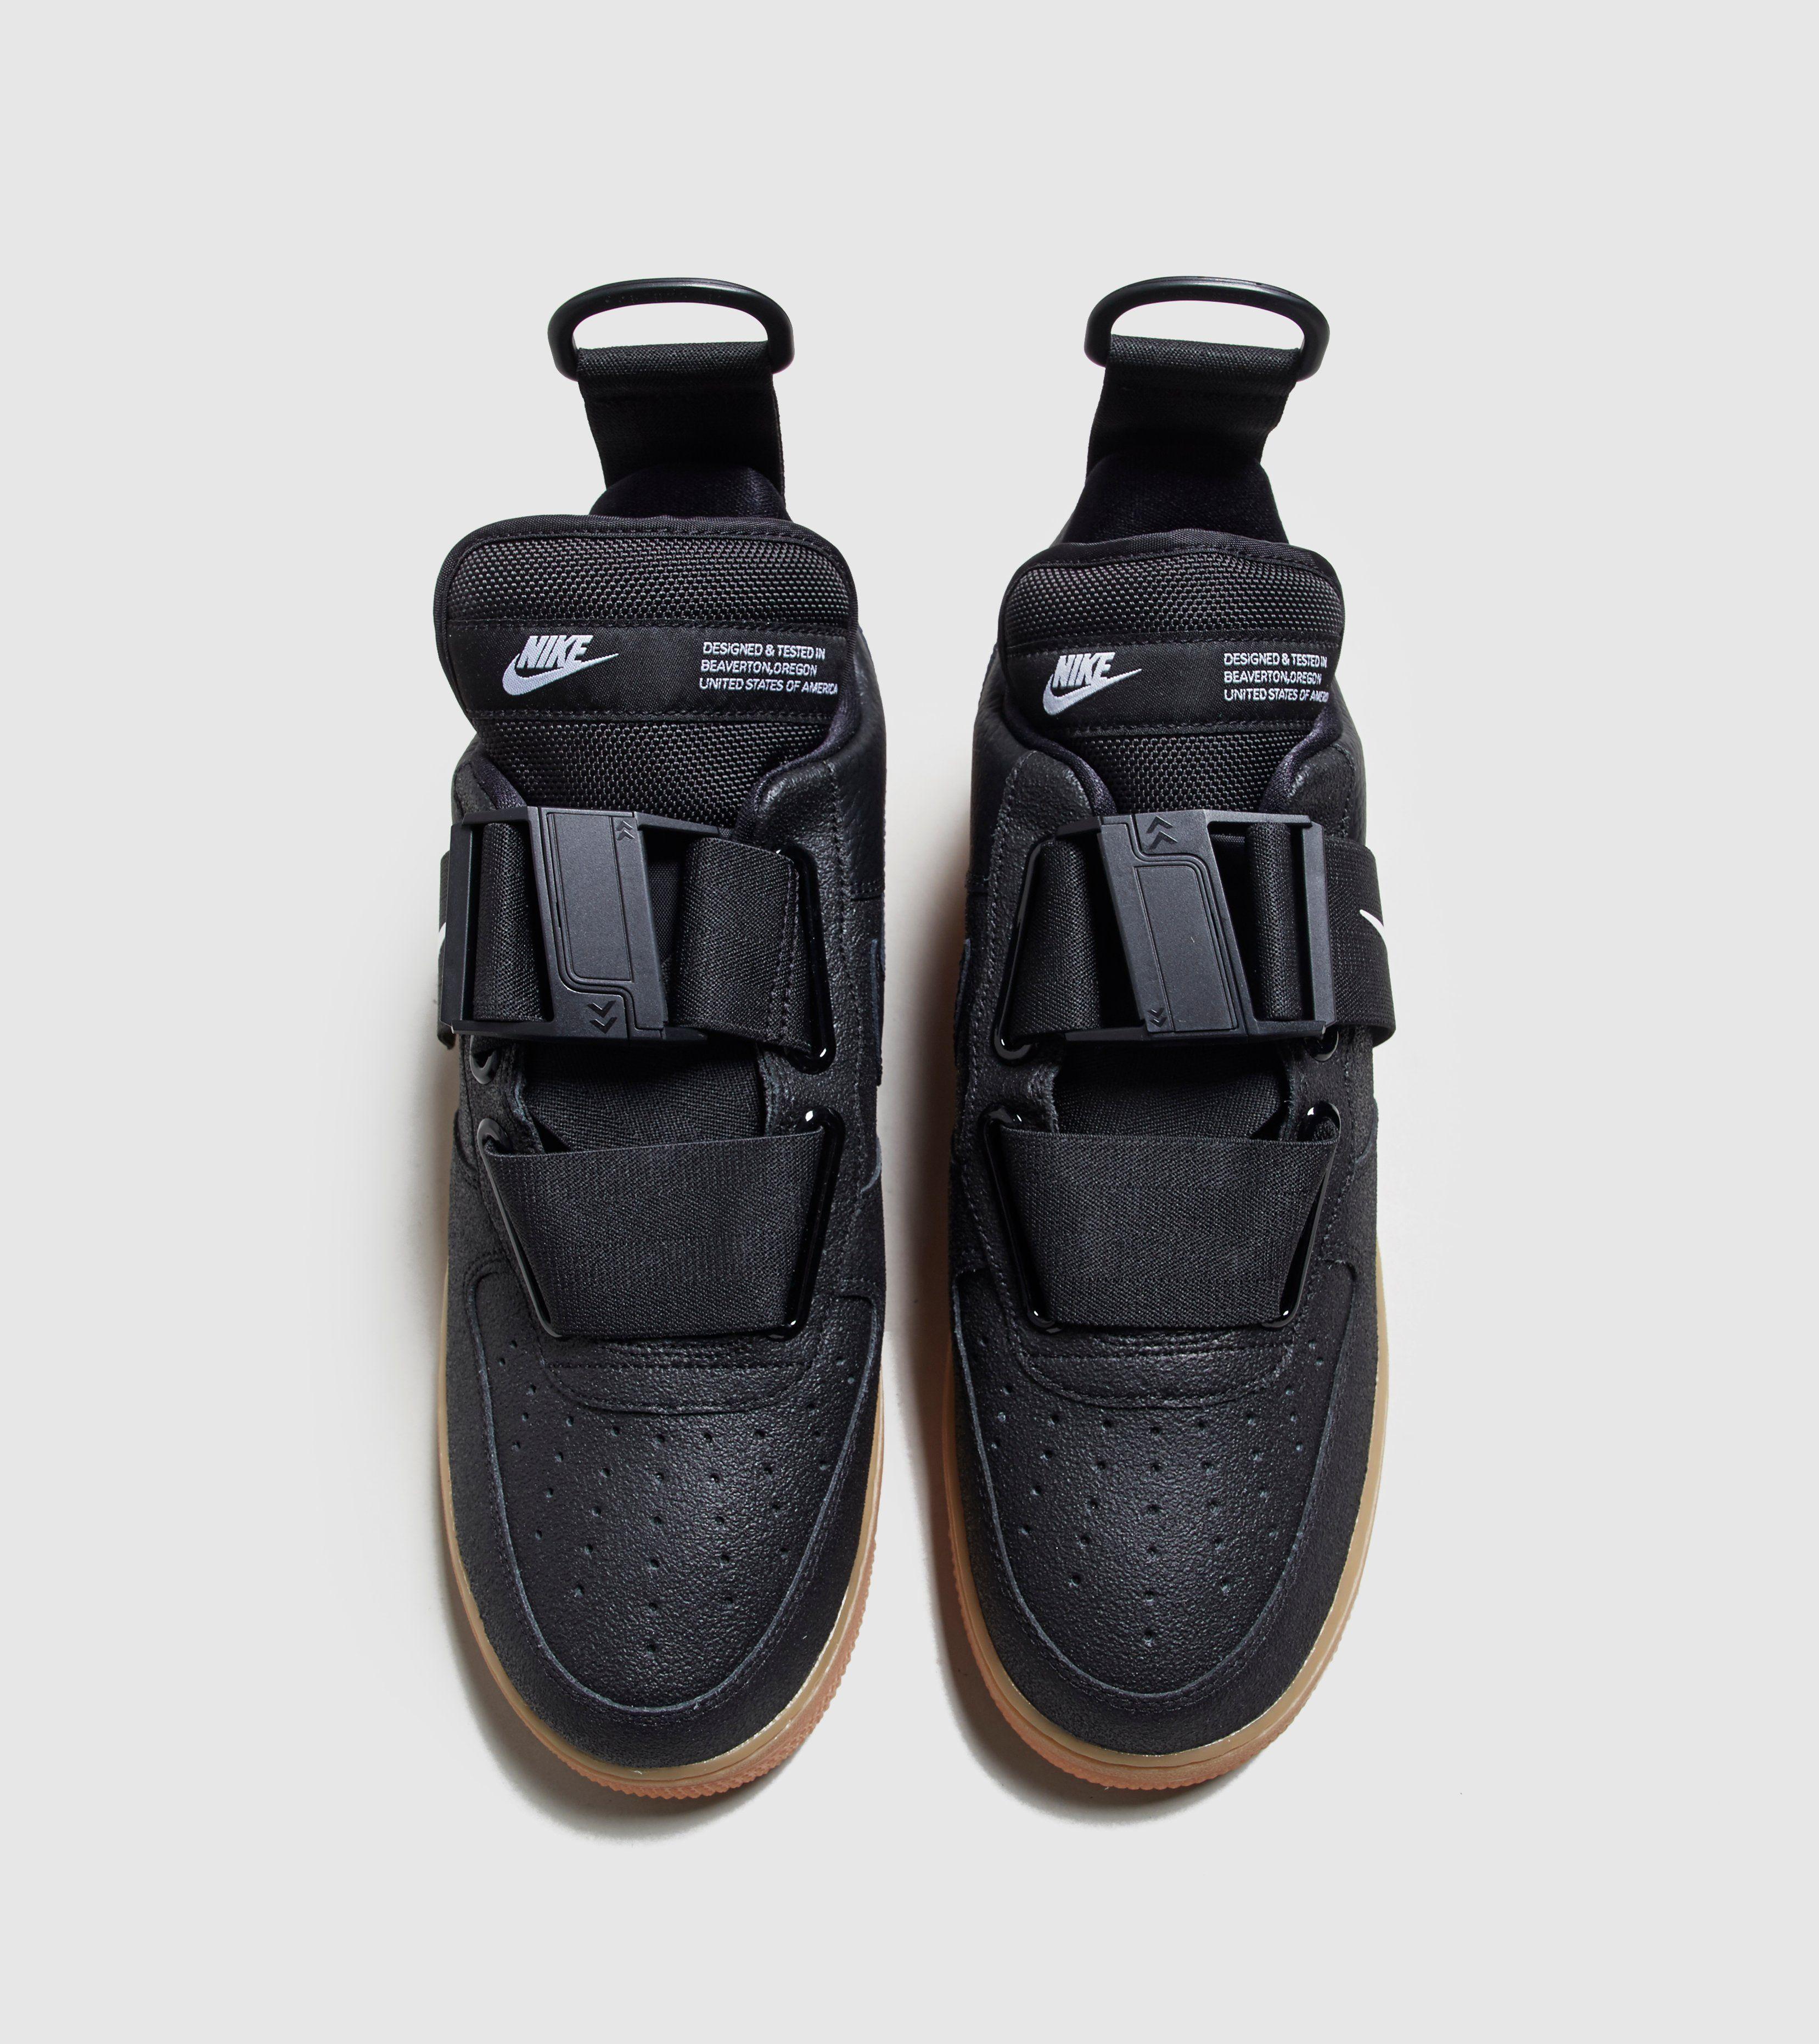 Nike Air Force 1 'Utility'